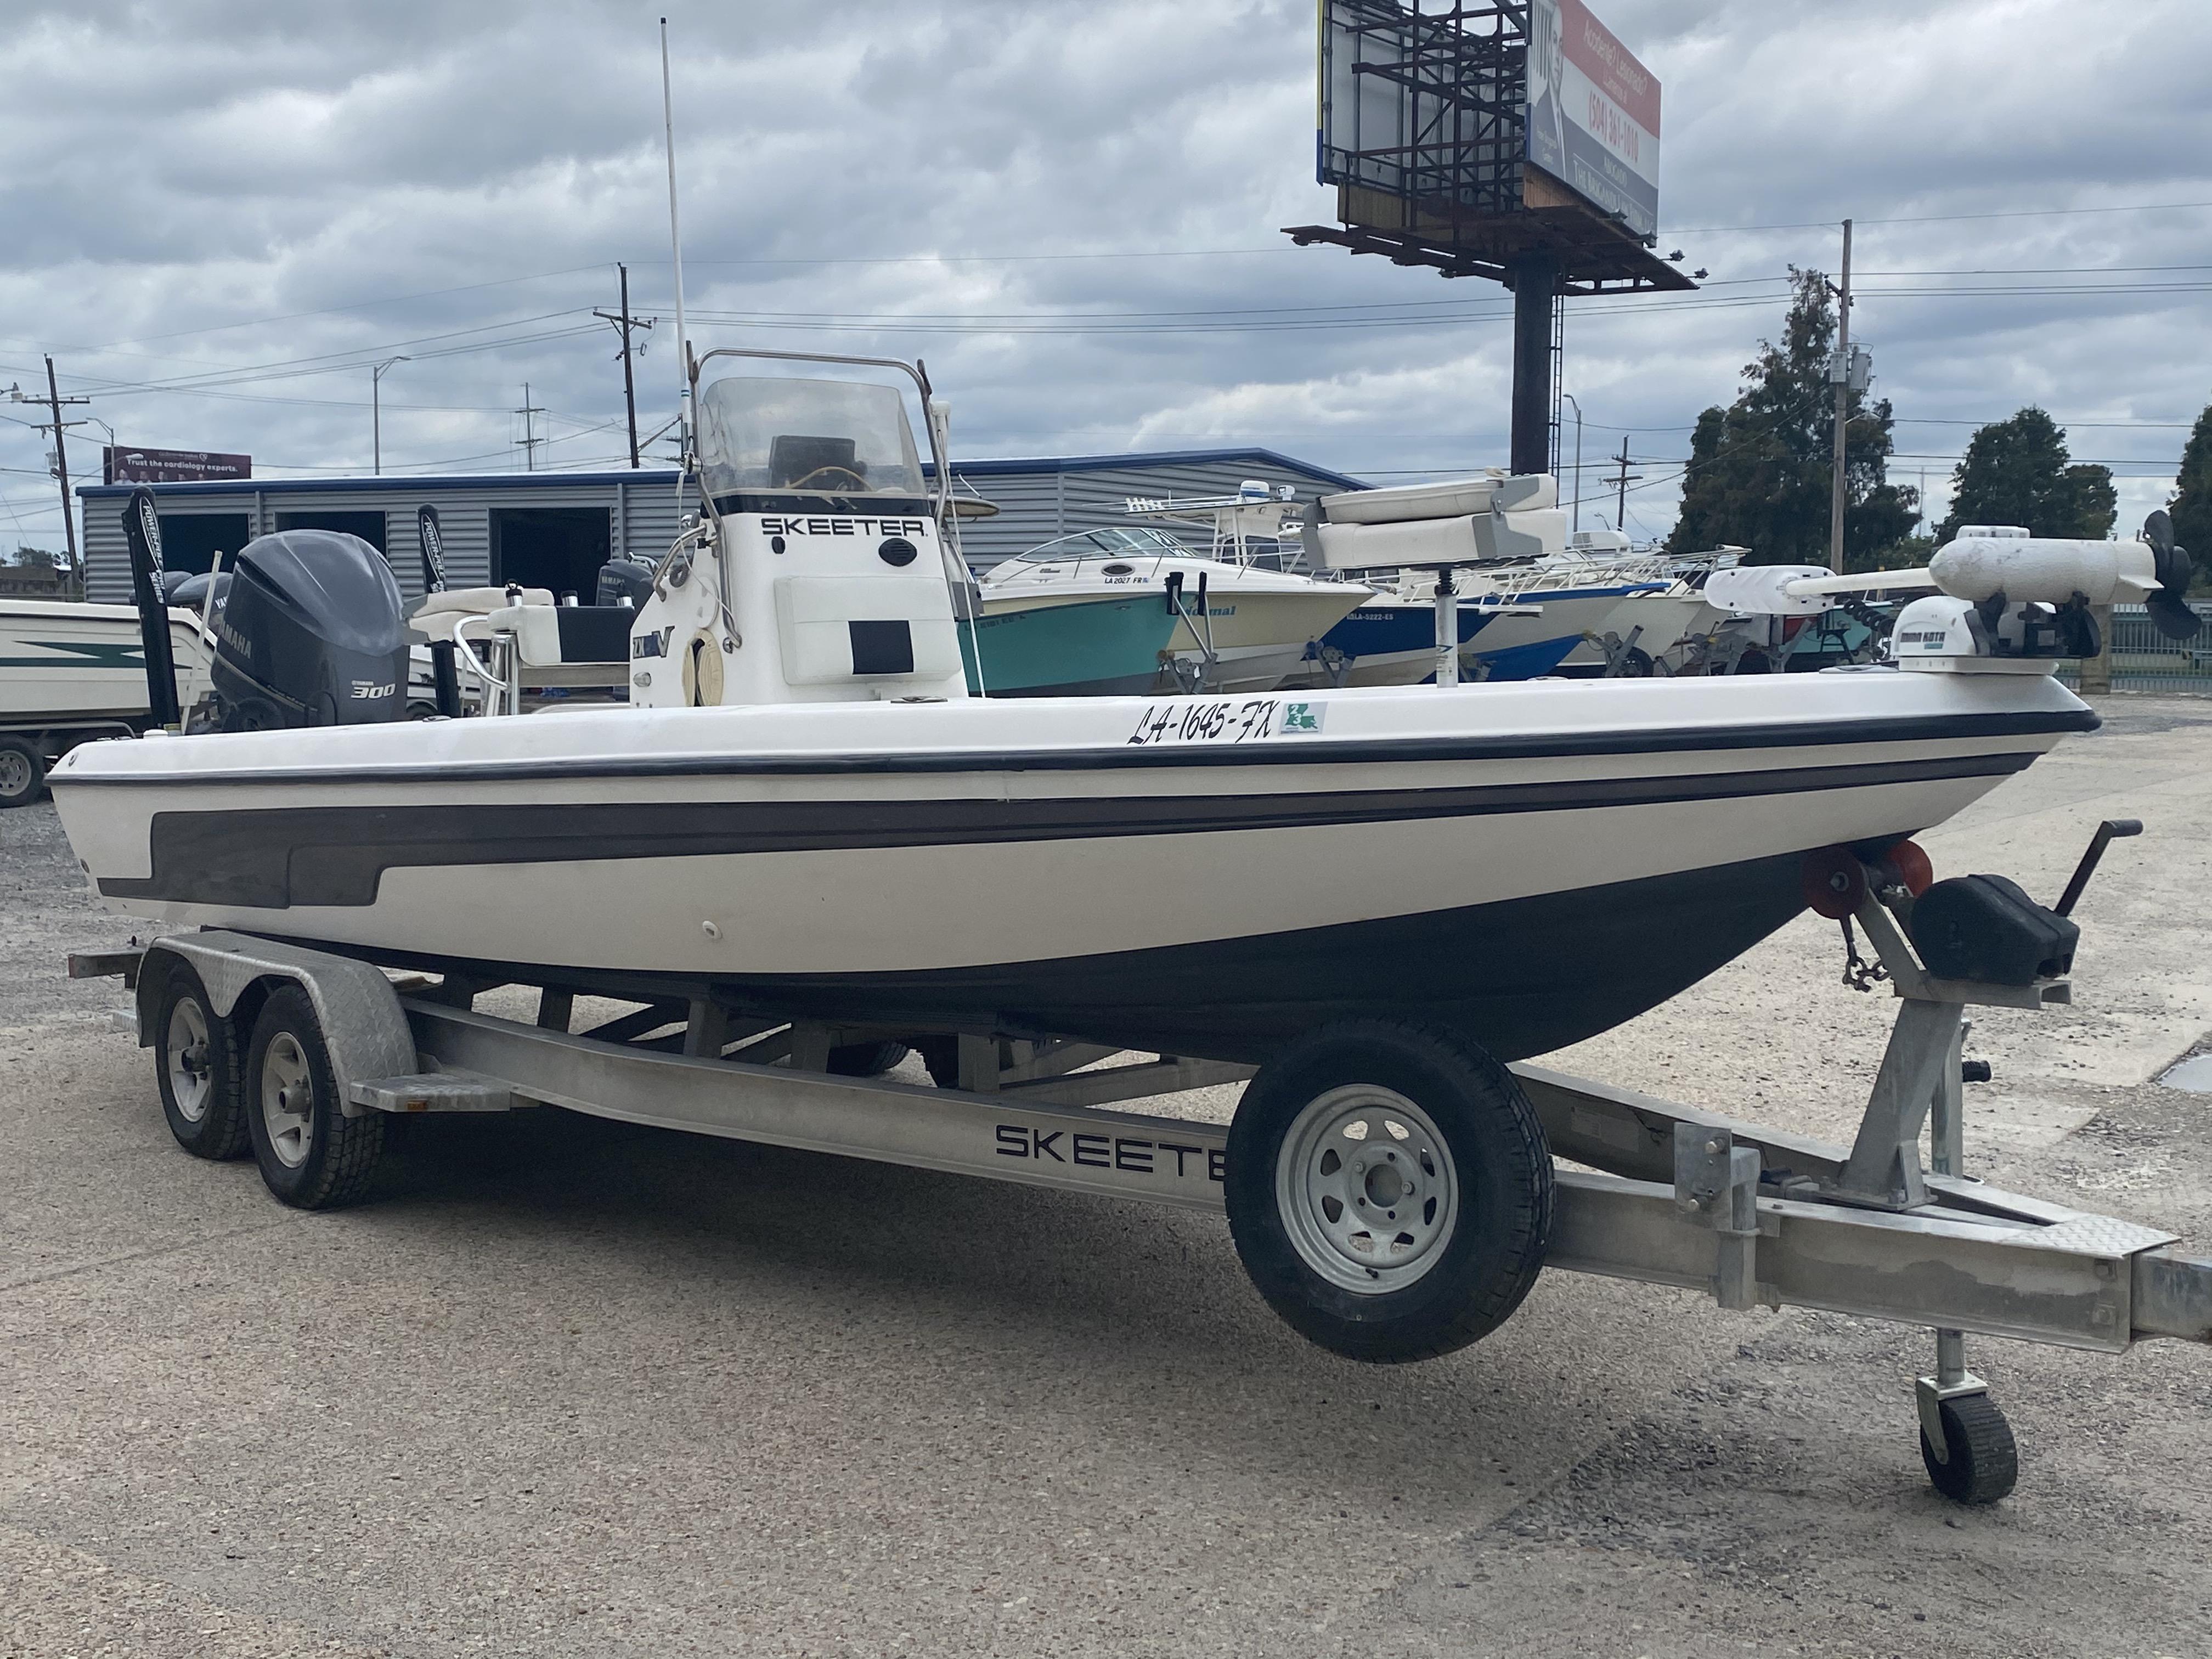 2010 Skeeter boat for sale, model of the boat is ZX 24V & Image # 2 of 18